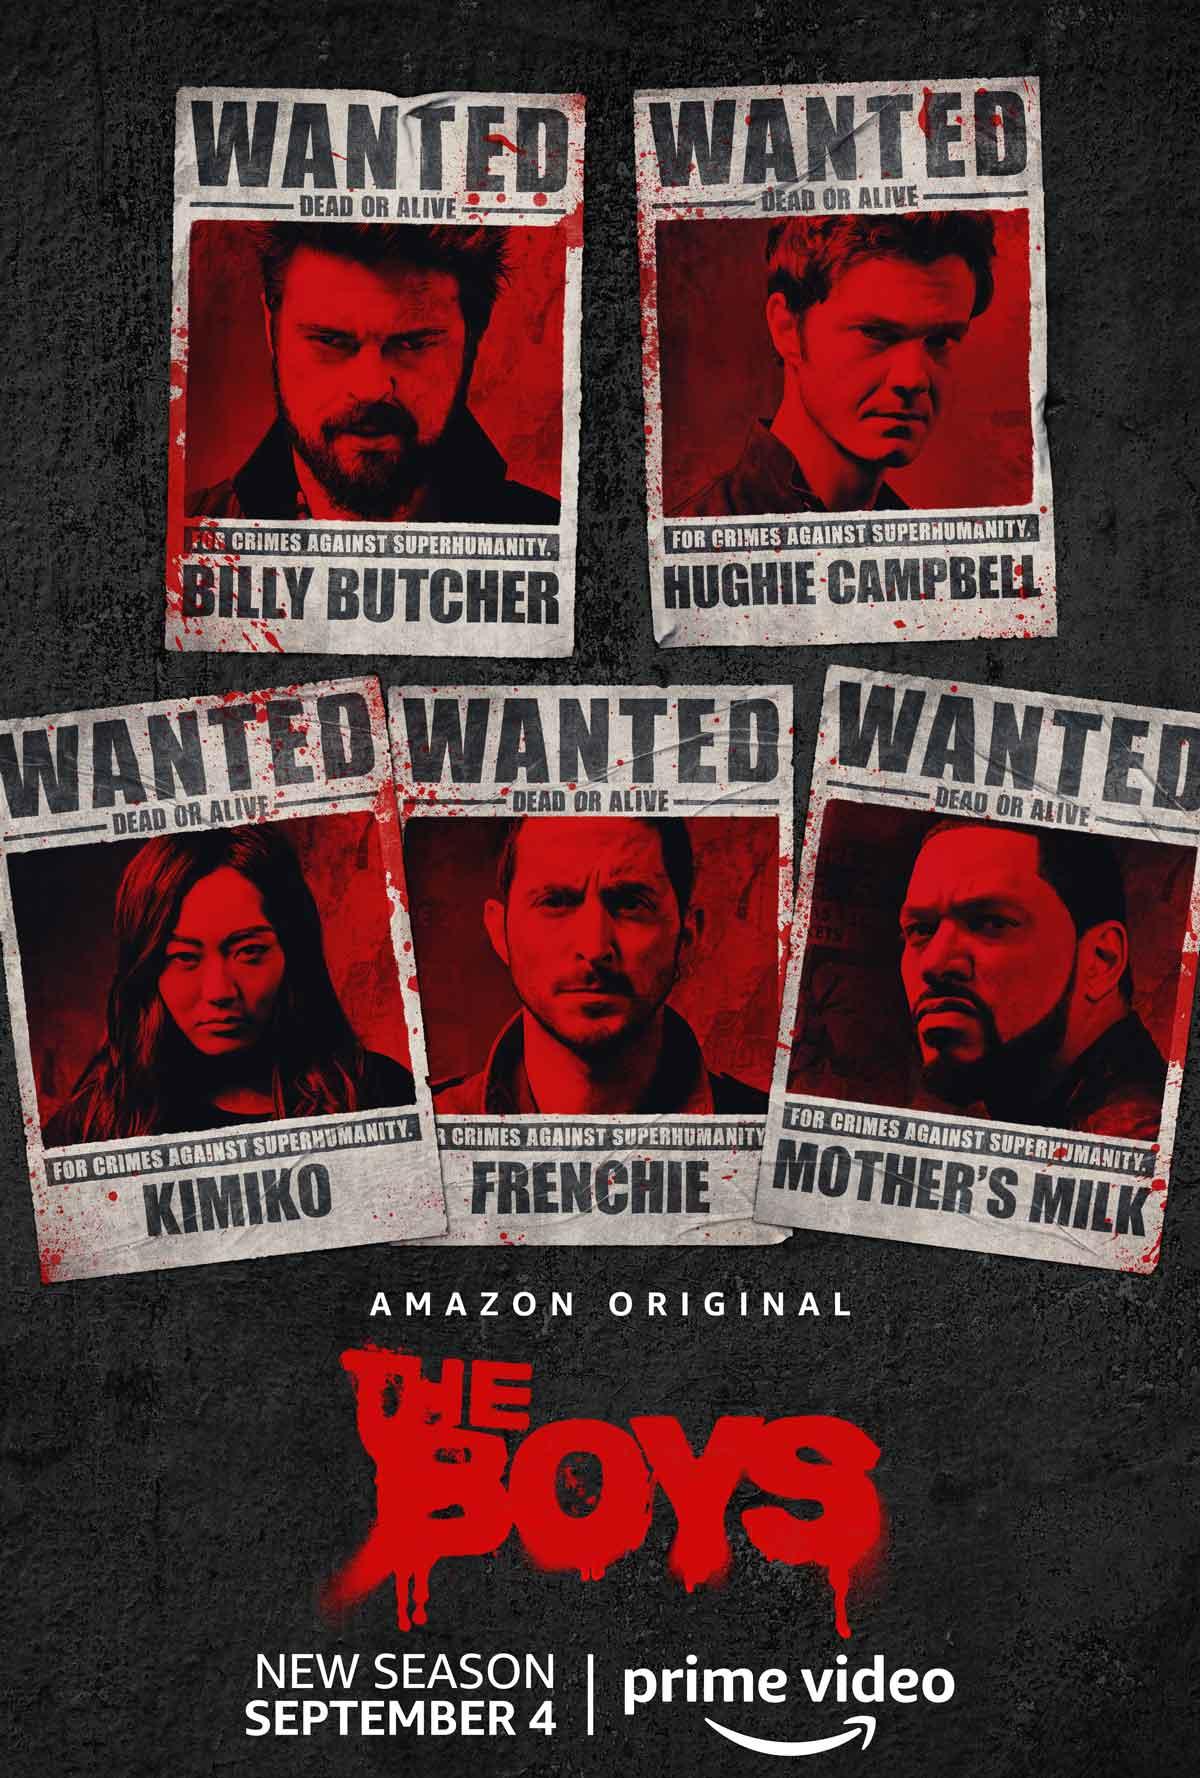 The boys poster temporada 2